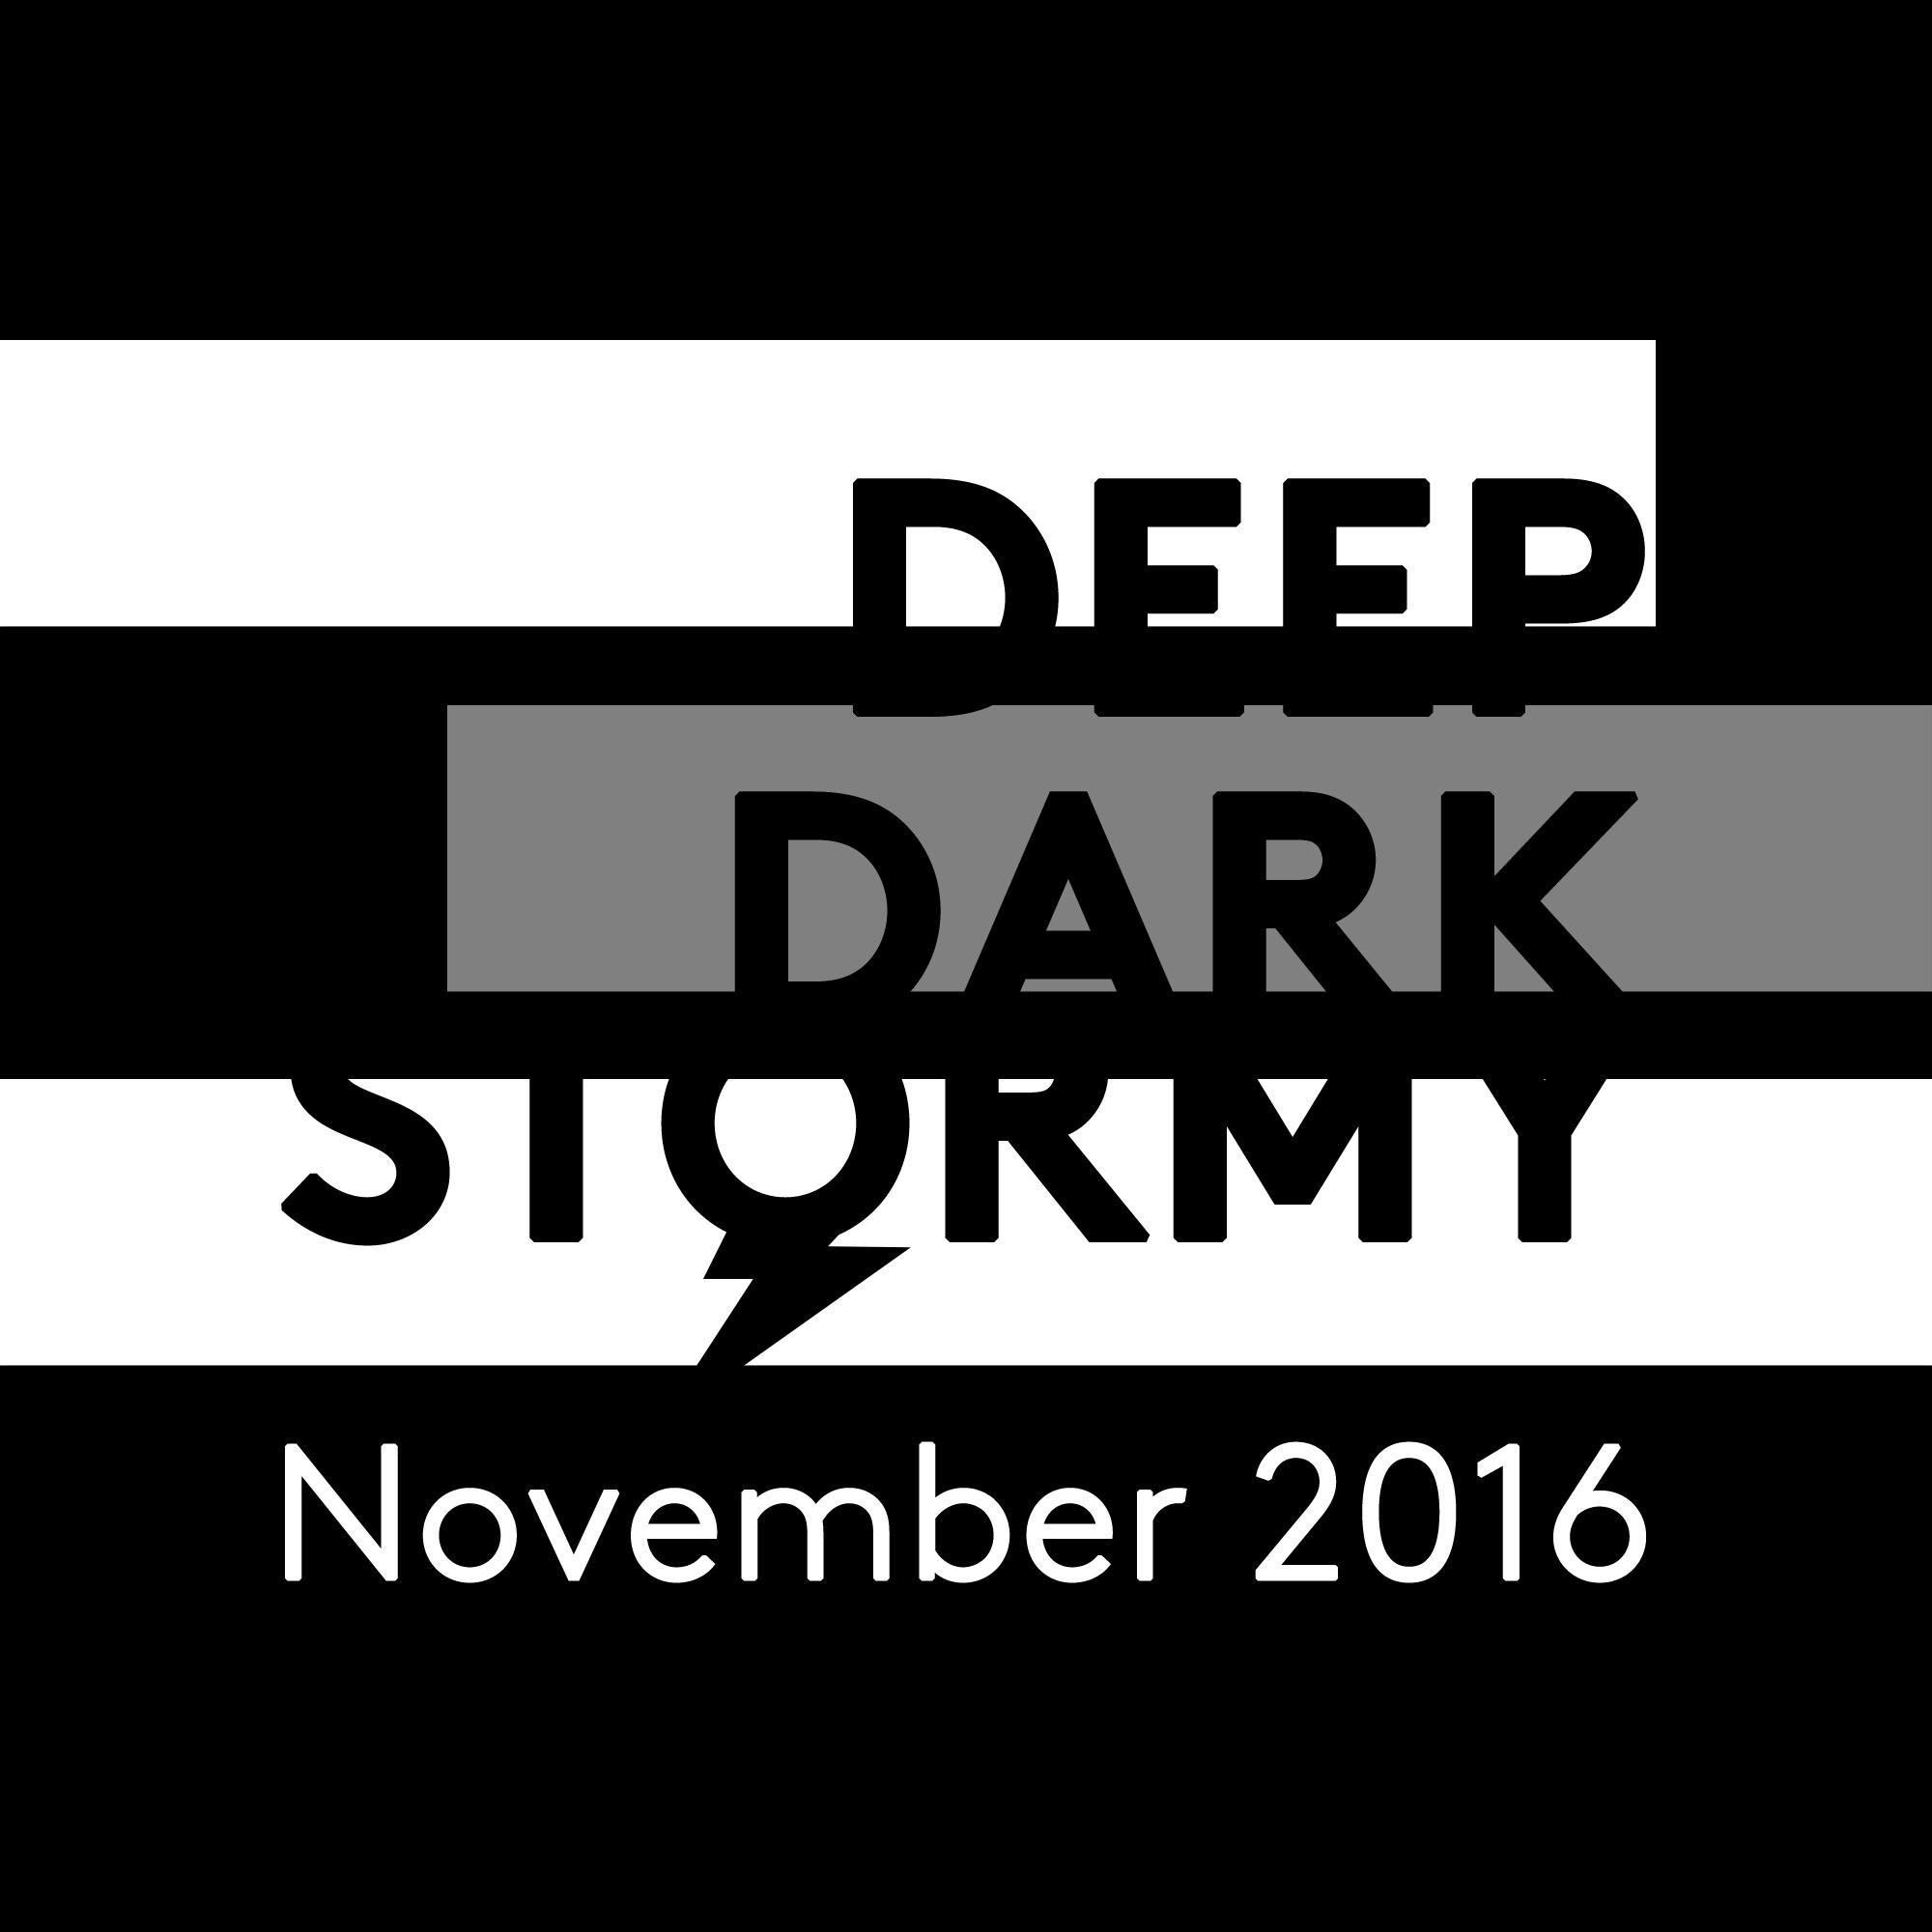 Deep Dark Stormy - November 2016